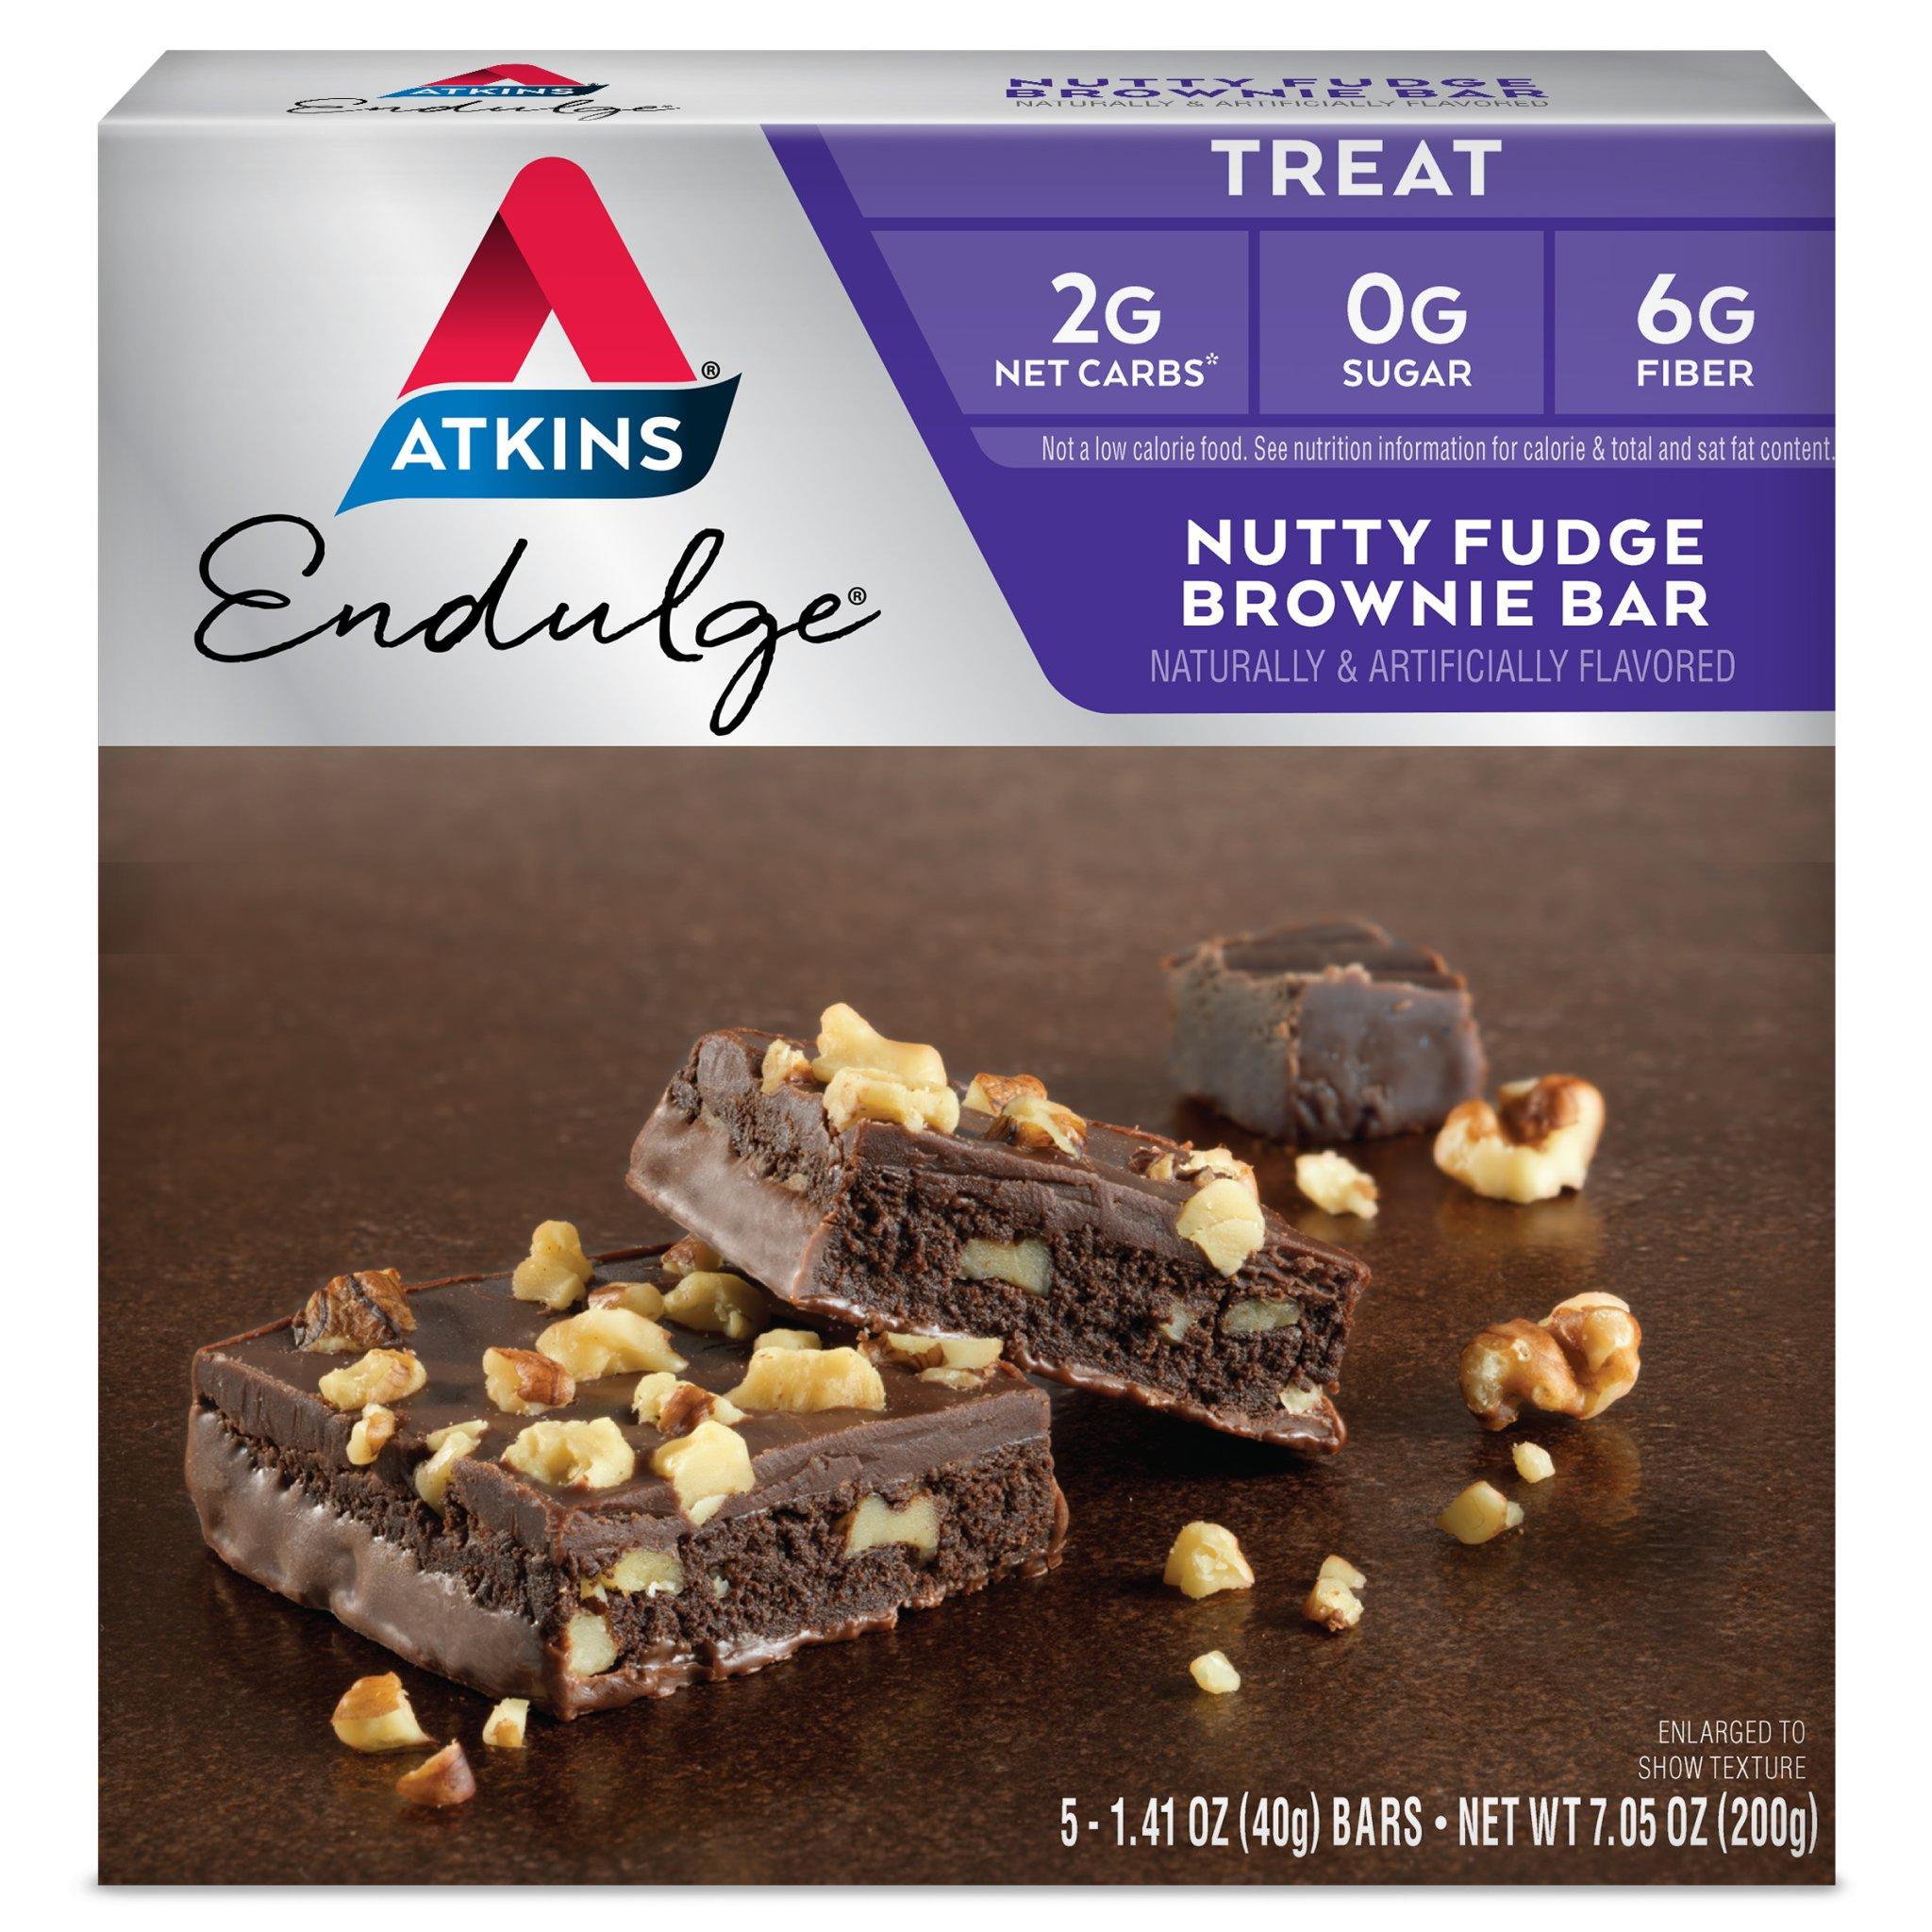 Atkins Endulge Treat, Nutty Fudge Brownie Bar, 5 Bars